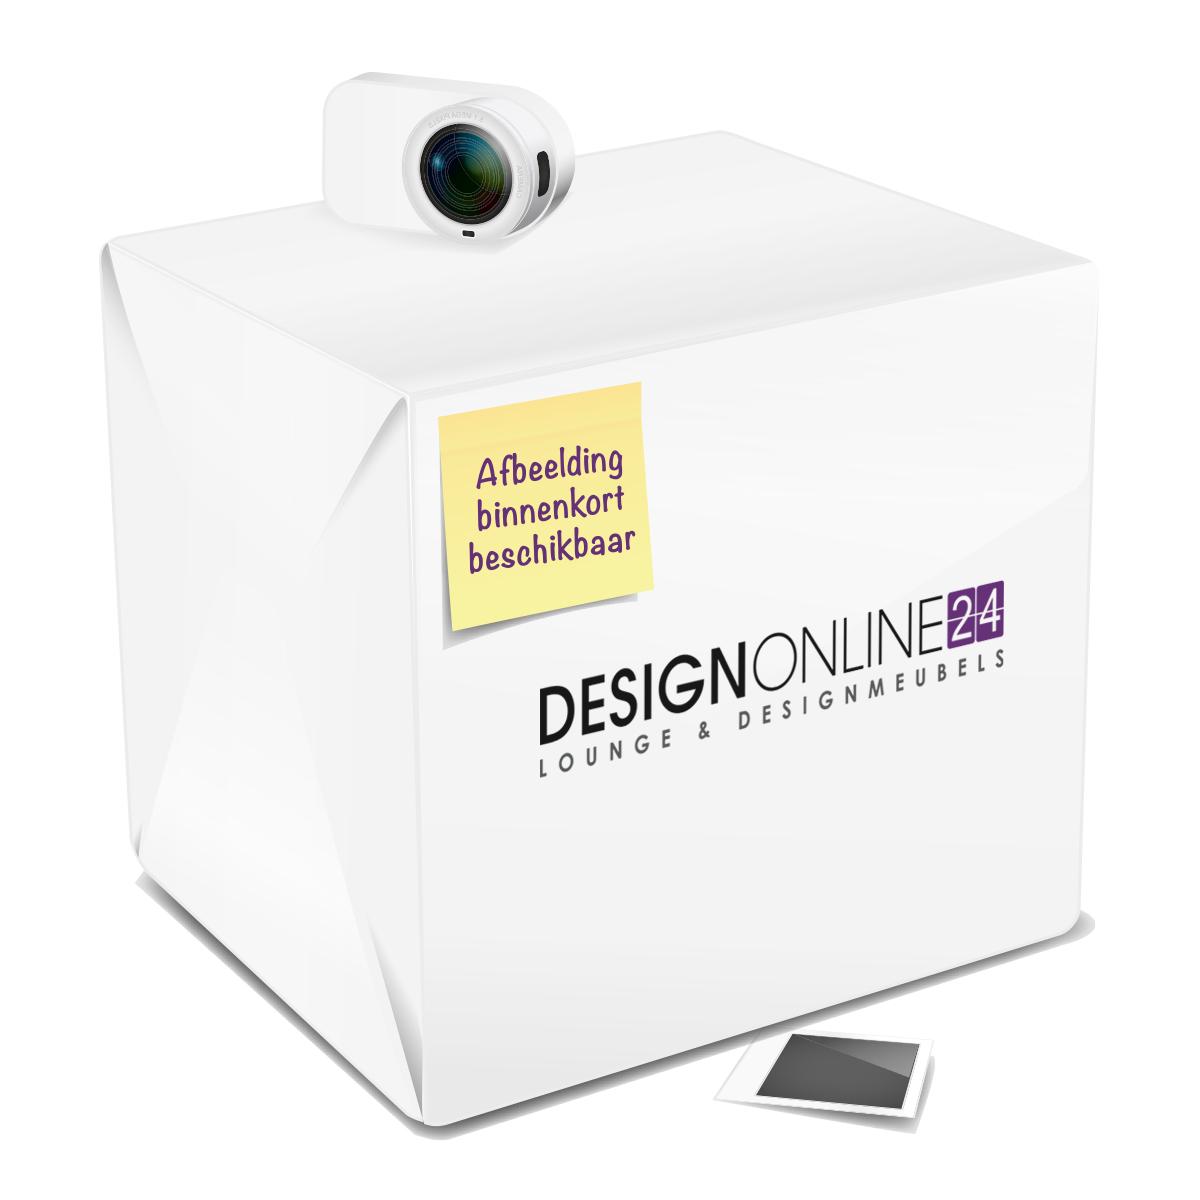 24Designs 24Designs Set (2) Barkrukken Scarlett - Zithoogte 75 cm - Donkergrijze Kunstleren Zitting